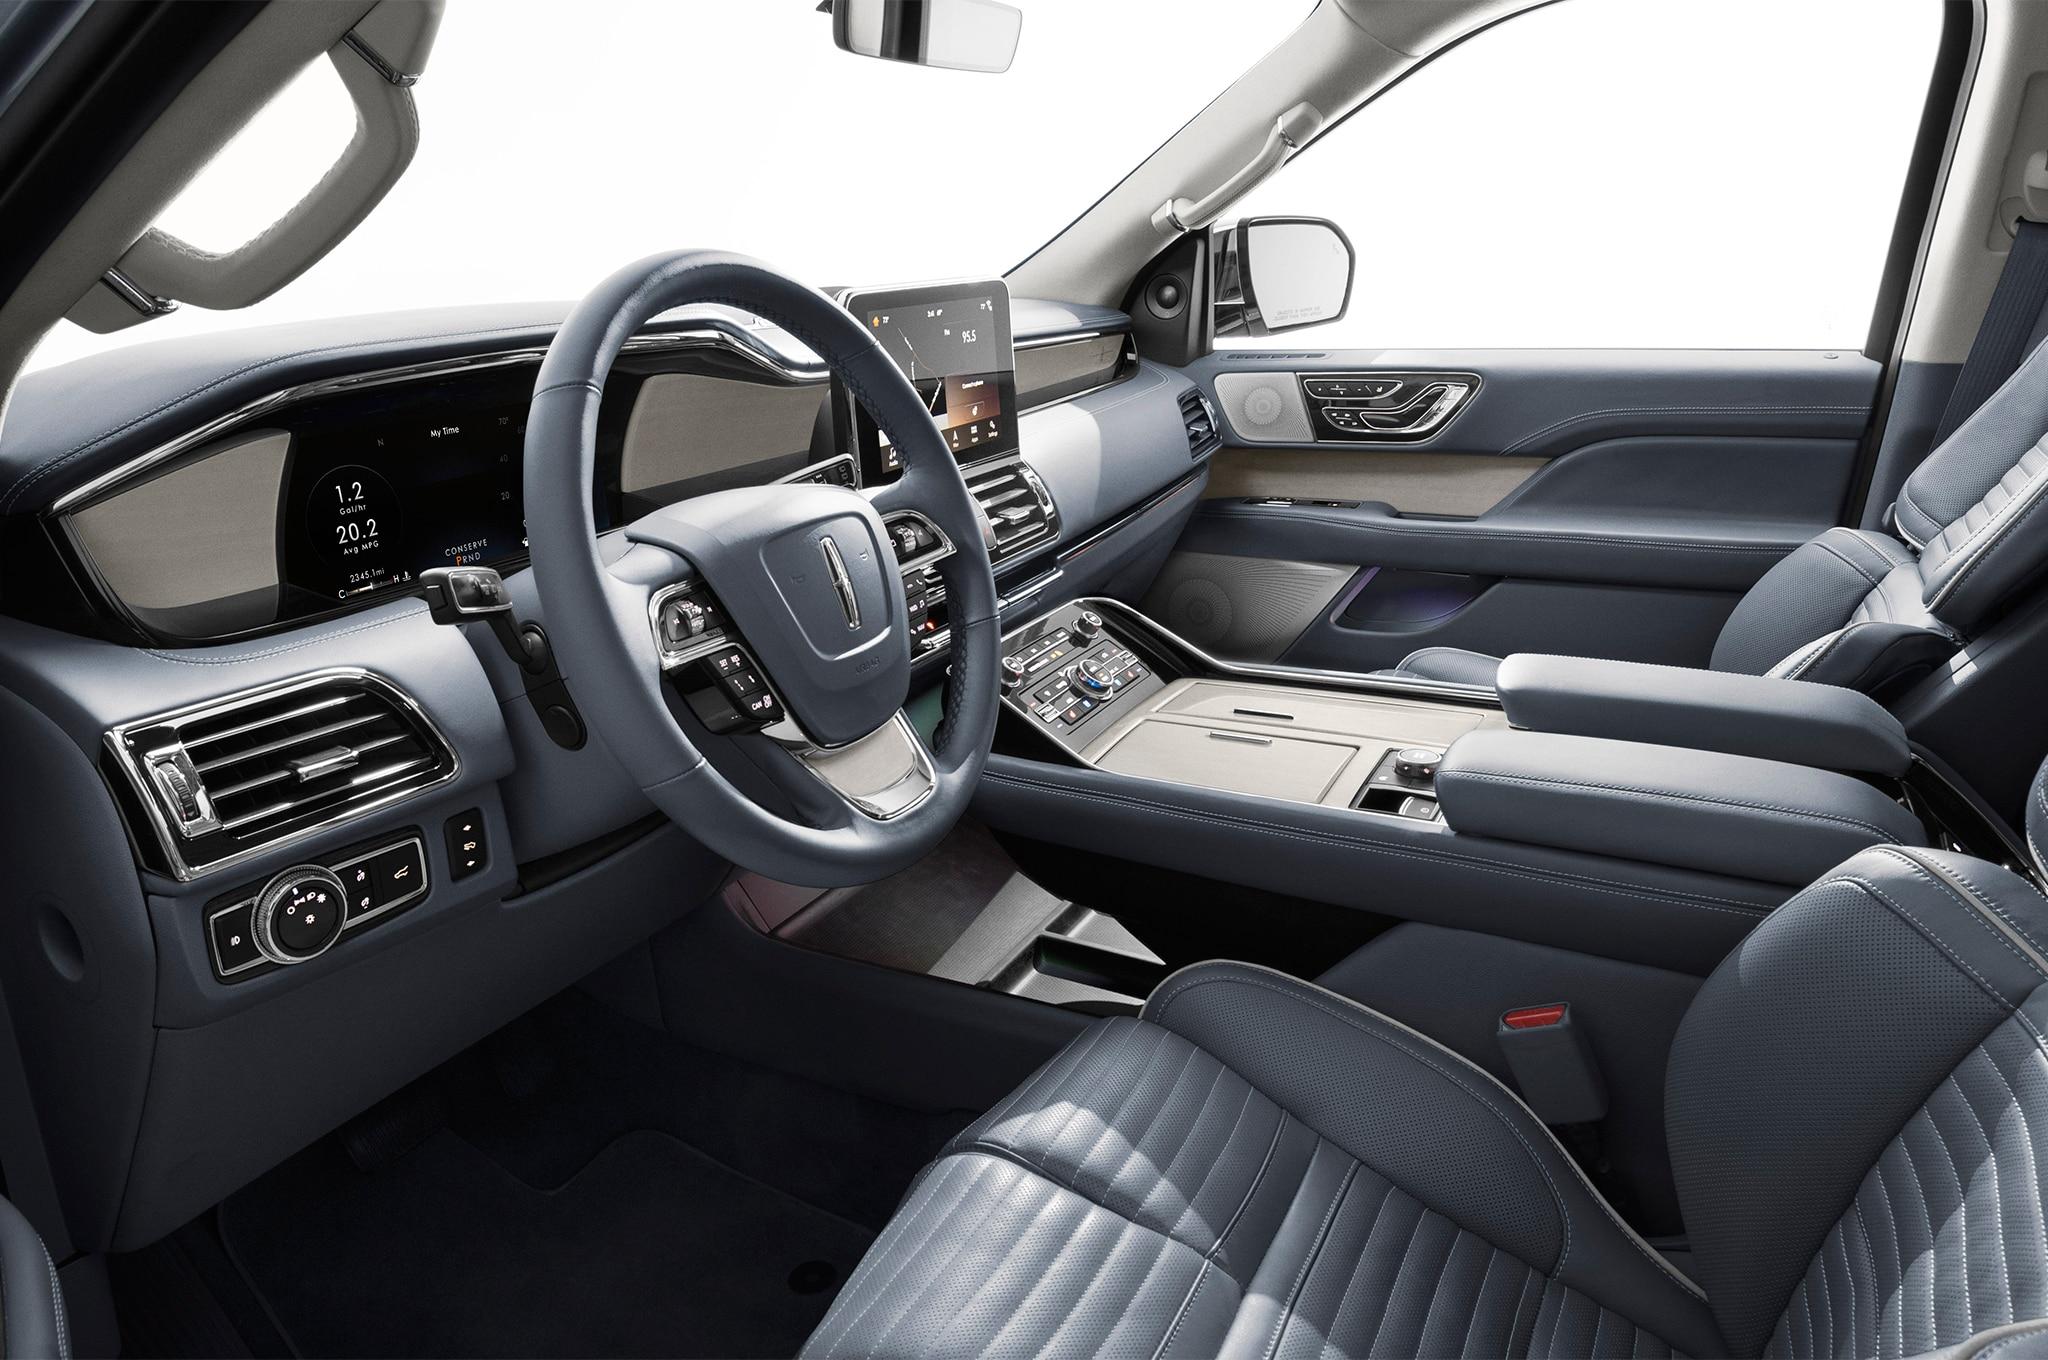 2018 Lincoln Navigator 4x4 Black Label Edition Quick Take ...